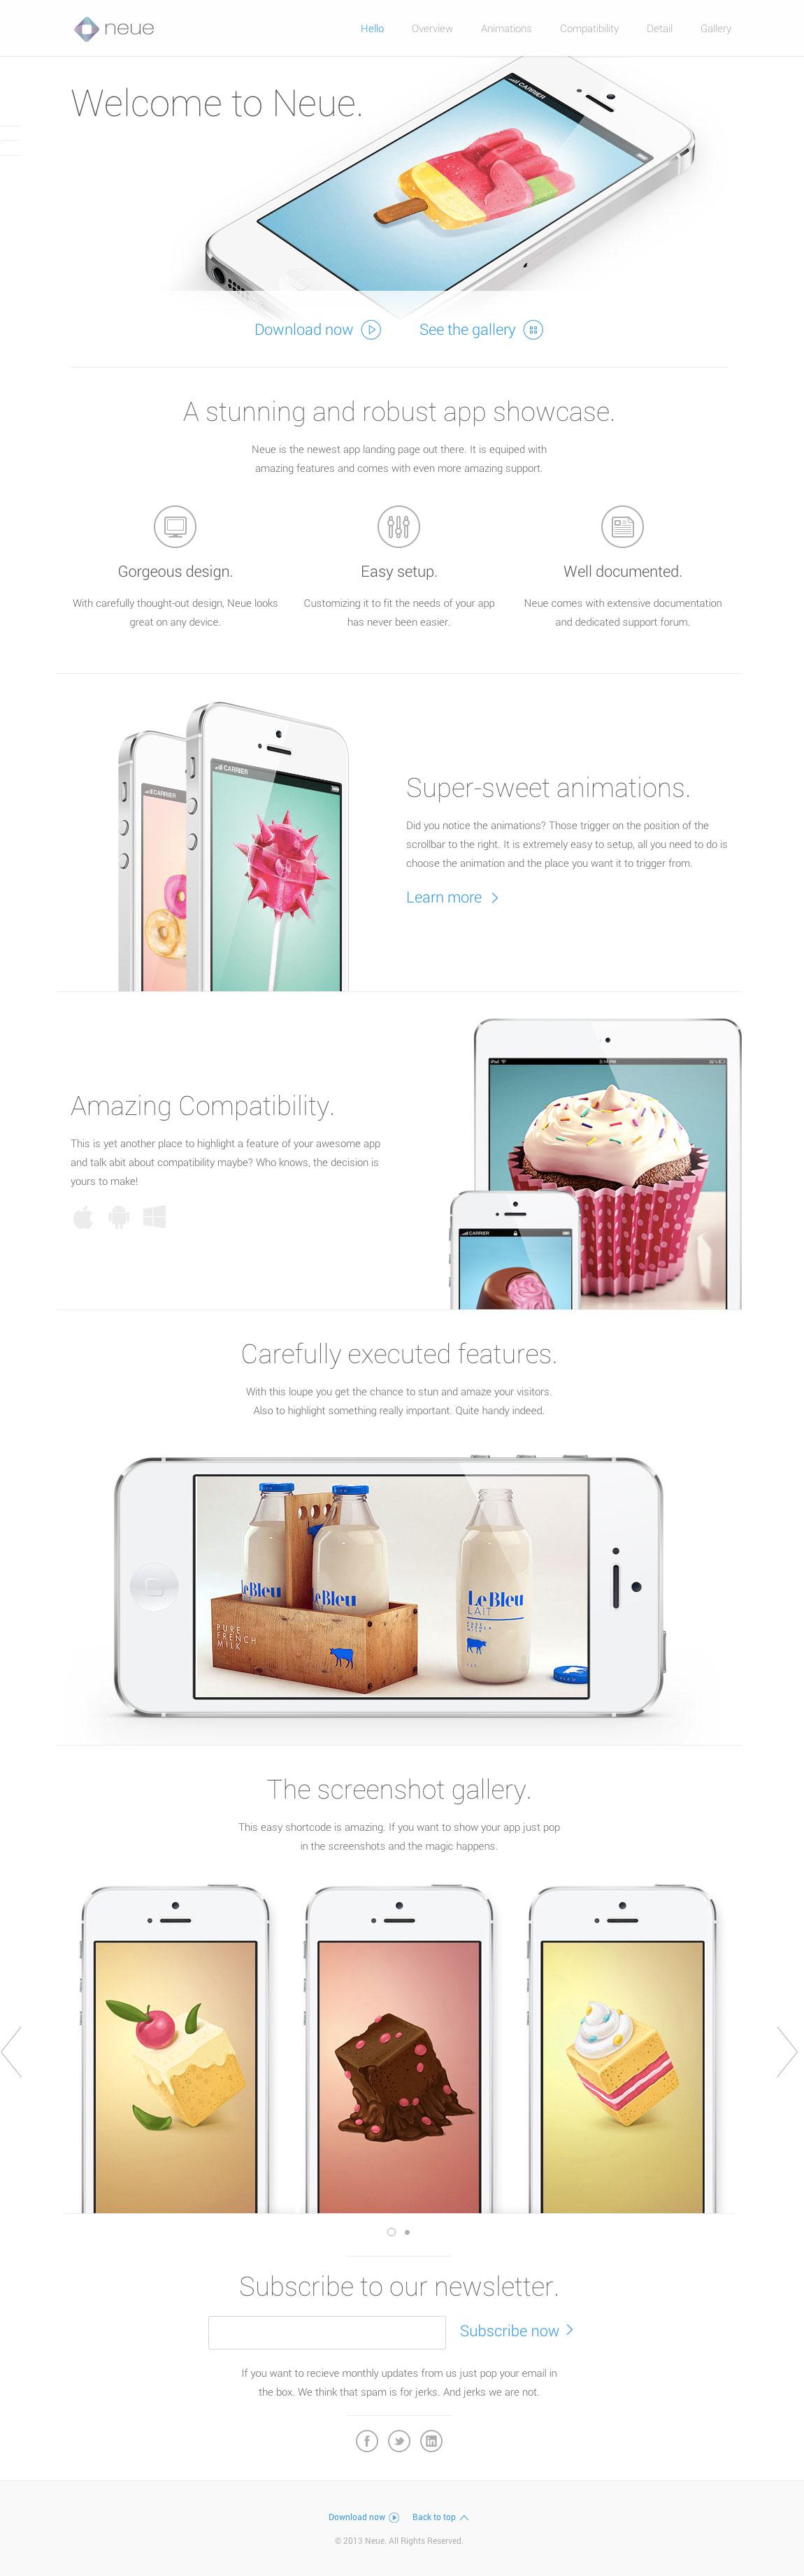 Neue Website Screenshot